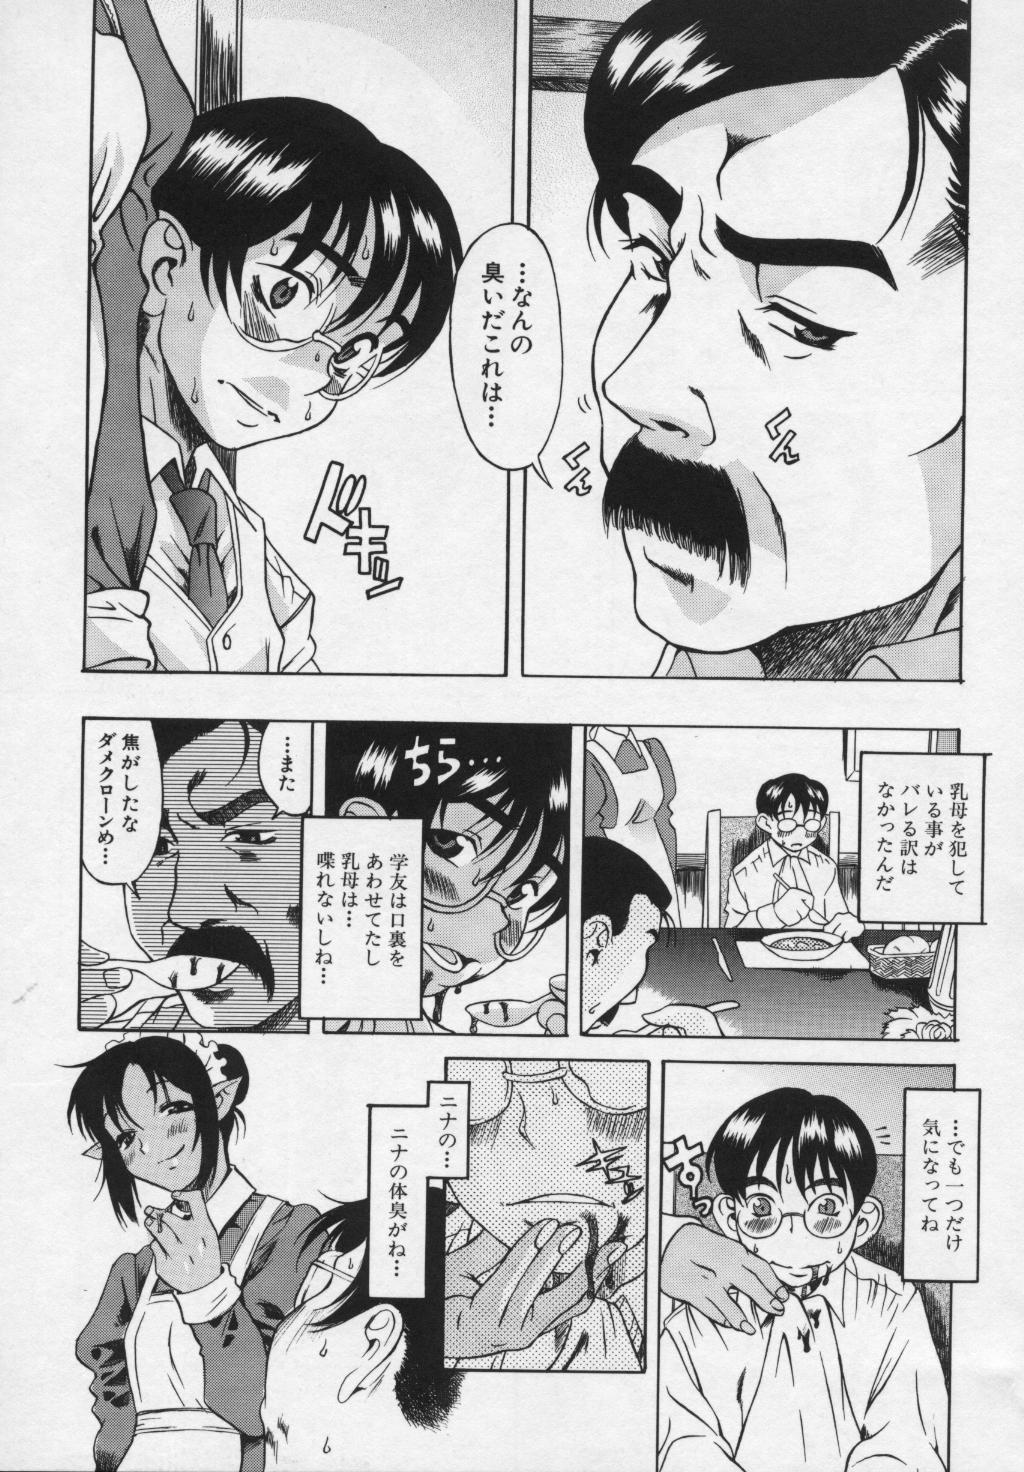 Kimi no Na o Yobeba - If I call your name. 159